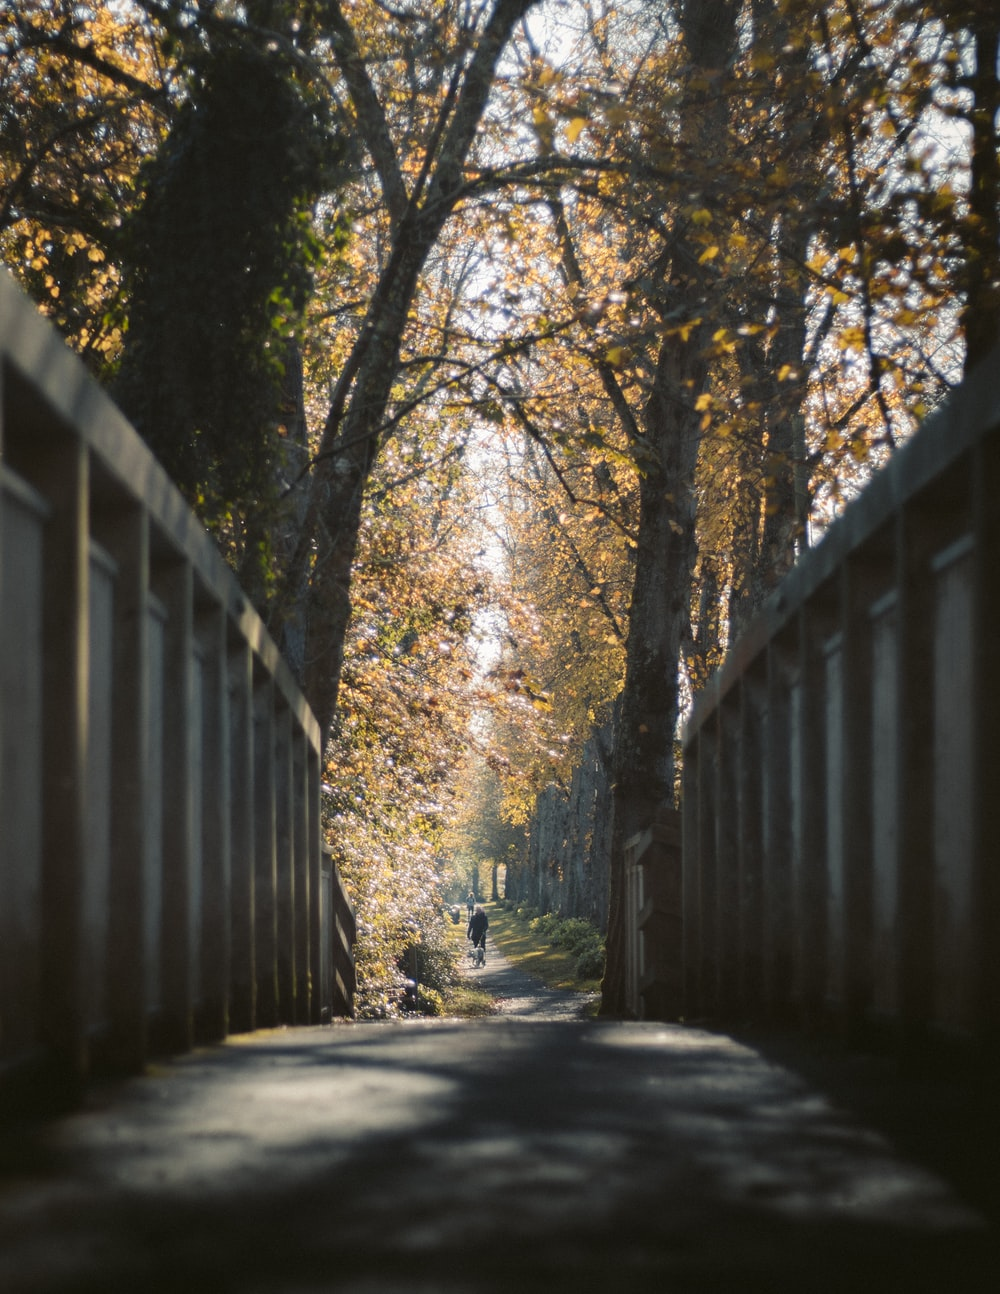 empty bridge during daytime